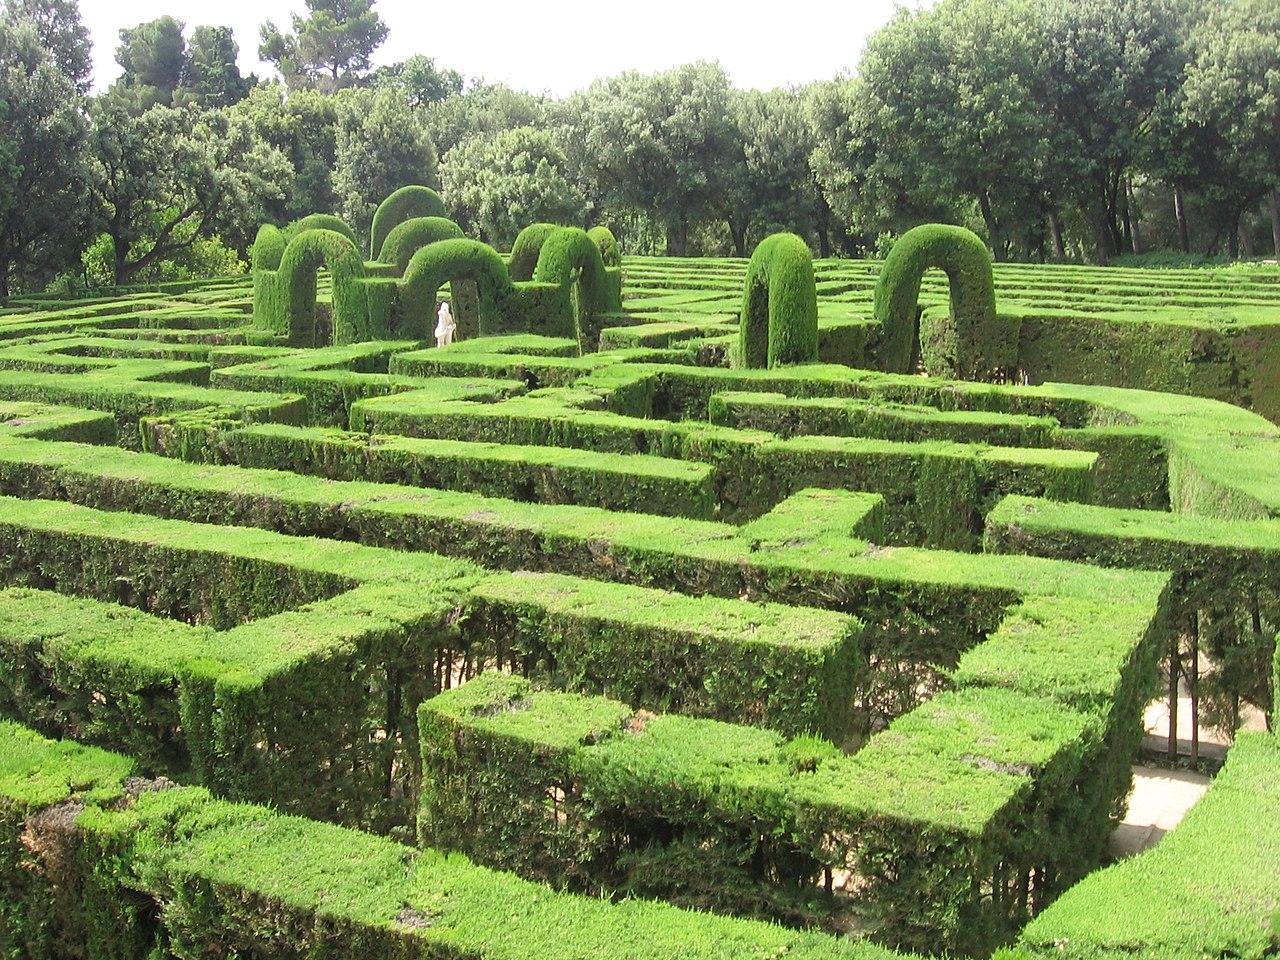 The Horta Labyrinth Park